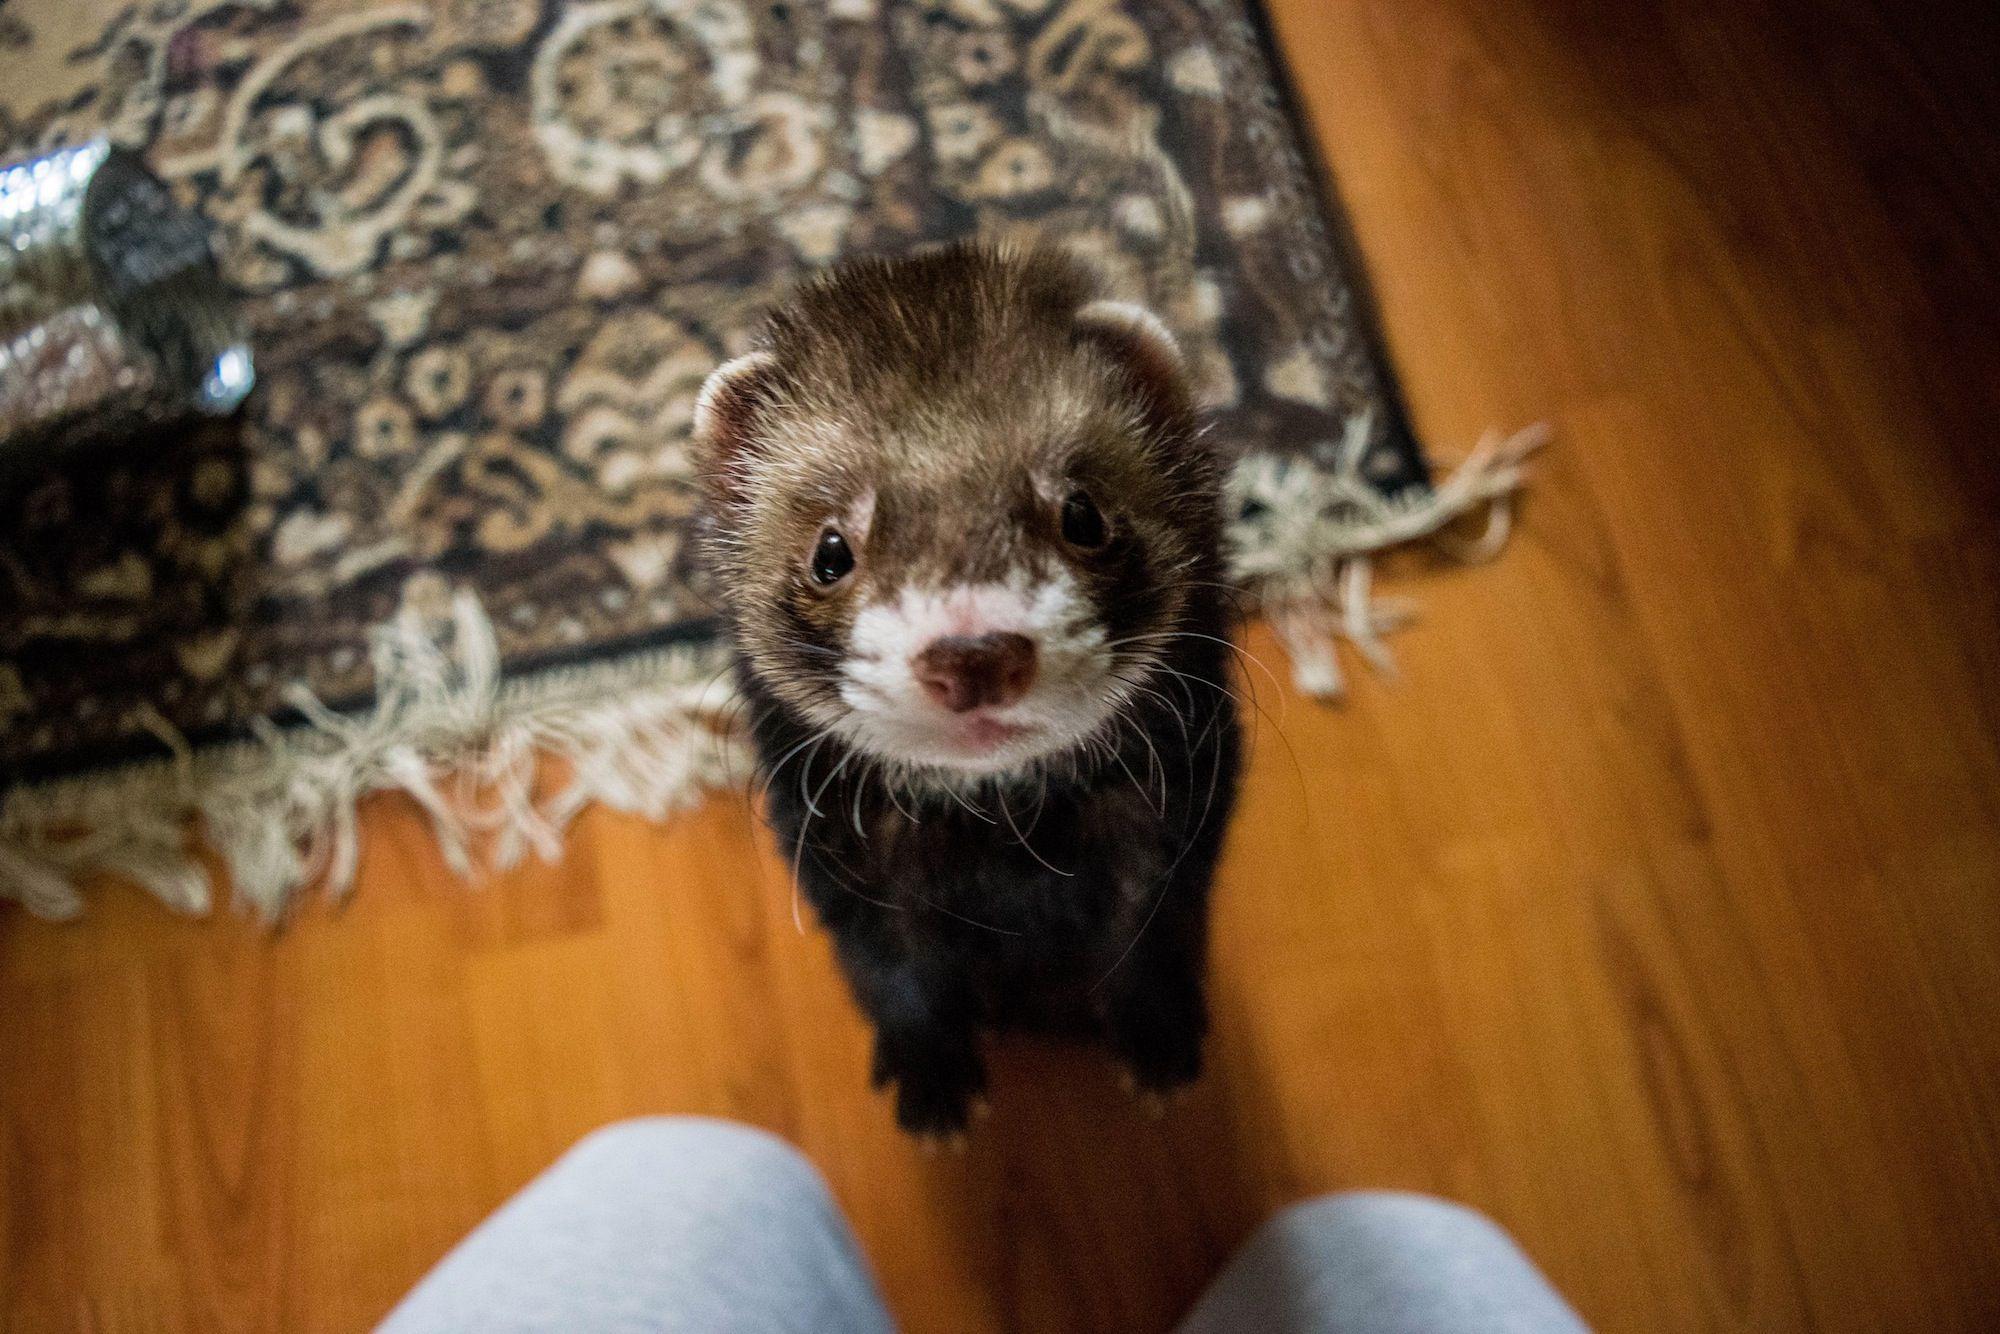 Ferret Ban In New Zealand Nz